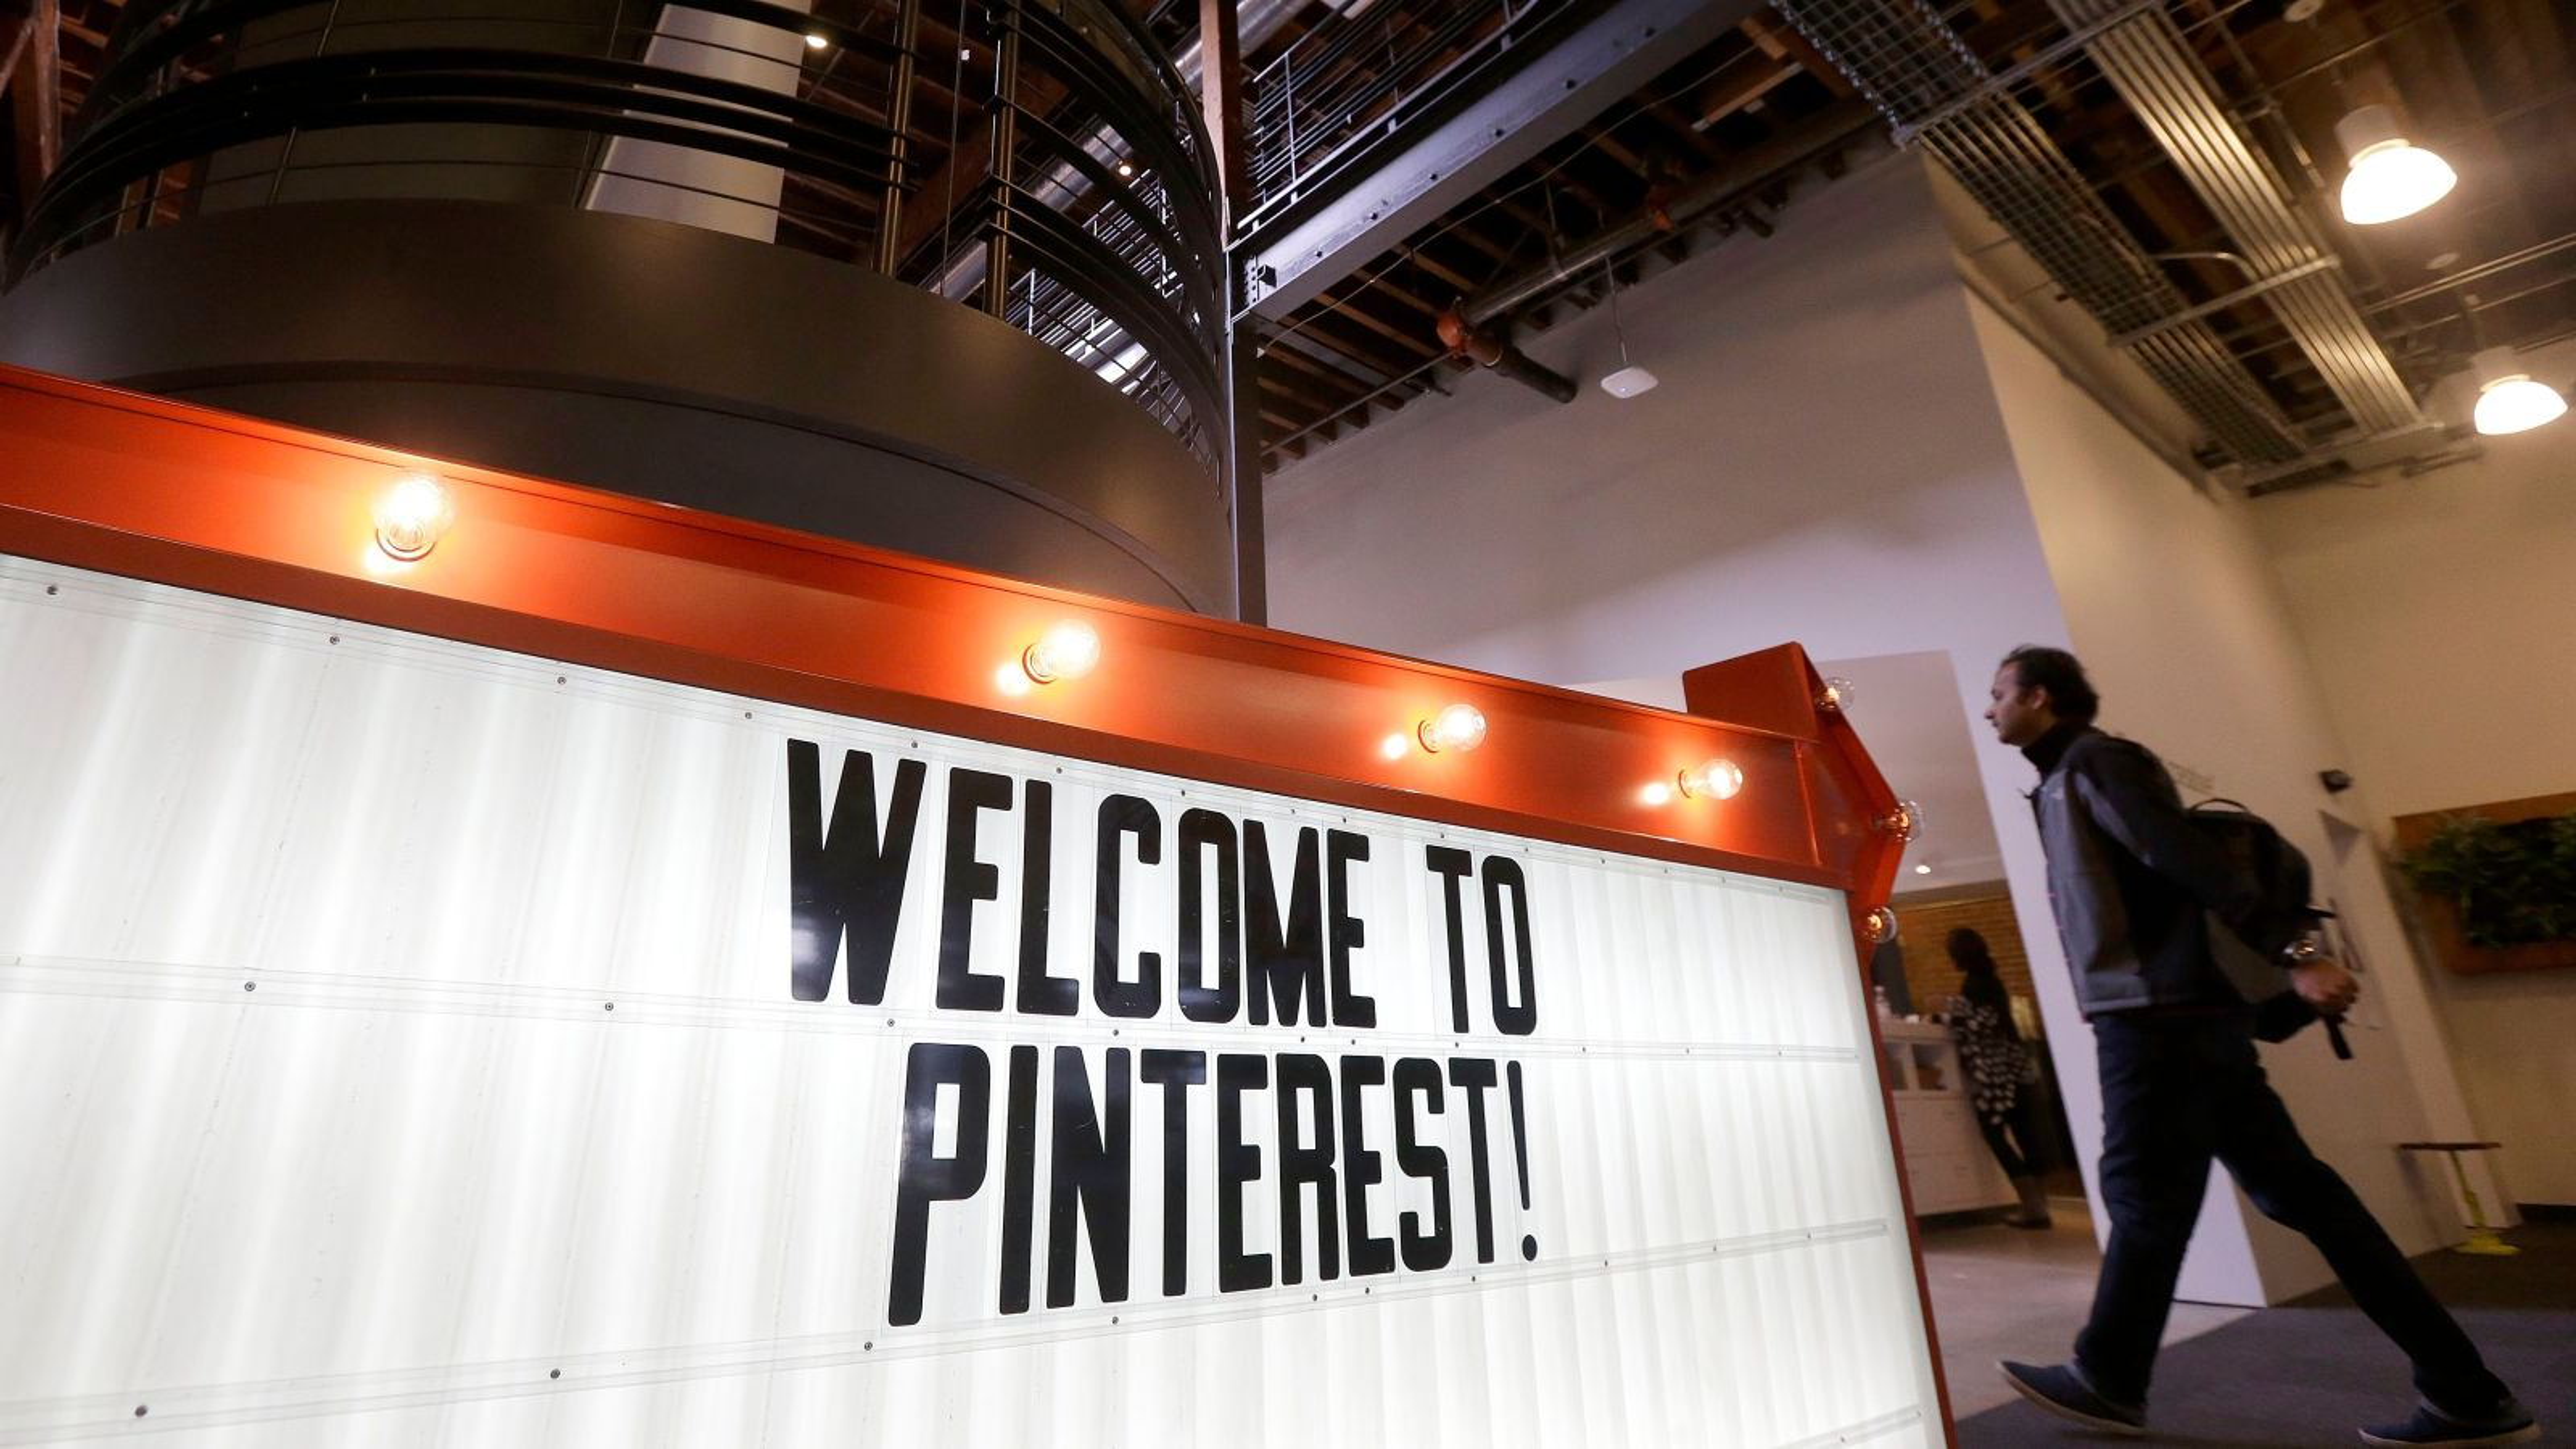 Pinterest Business News Pin Color Dots Desktop Wallpaper On About